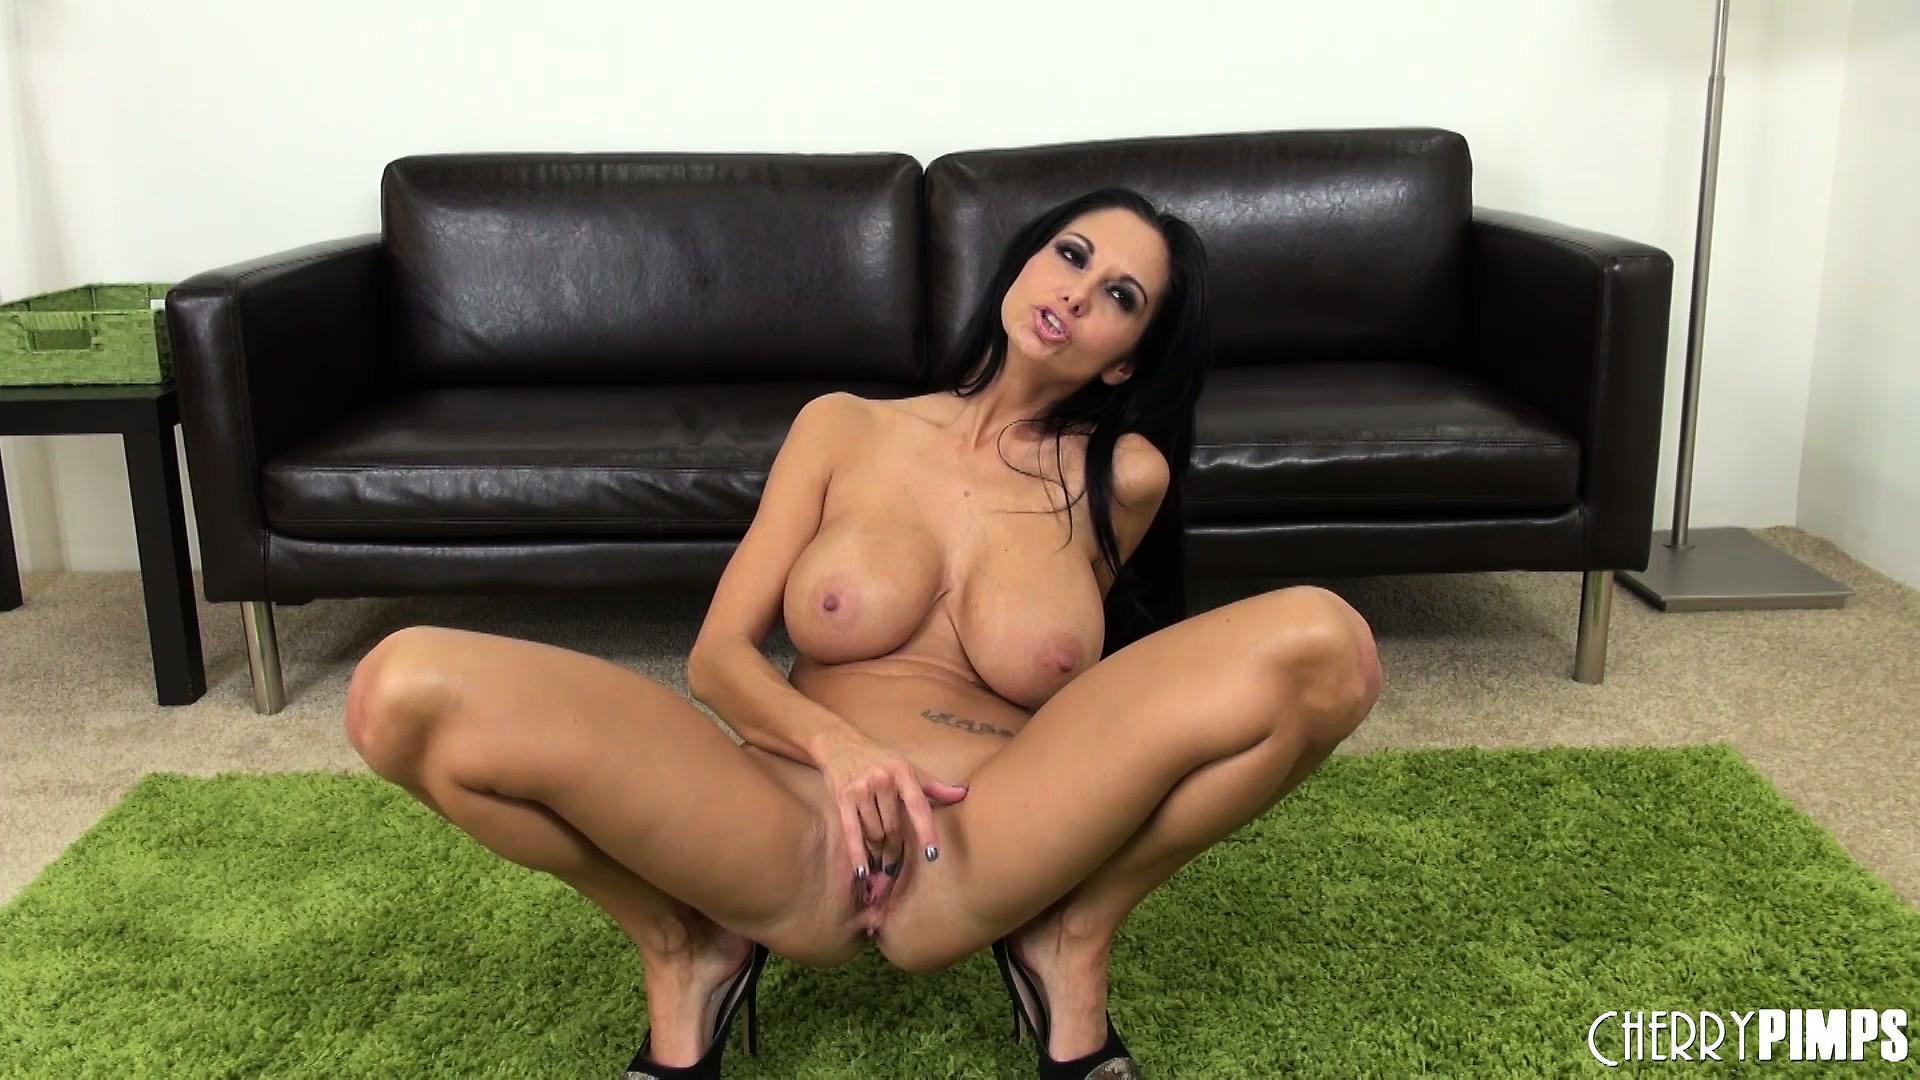 Avva Adams Porn watch only hd mobile porn videos - ava addams bares her